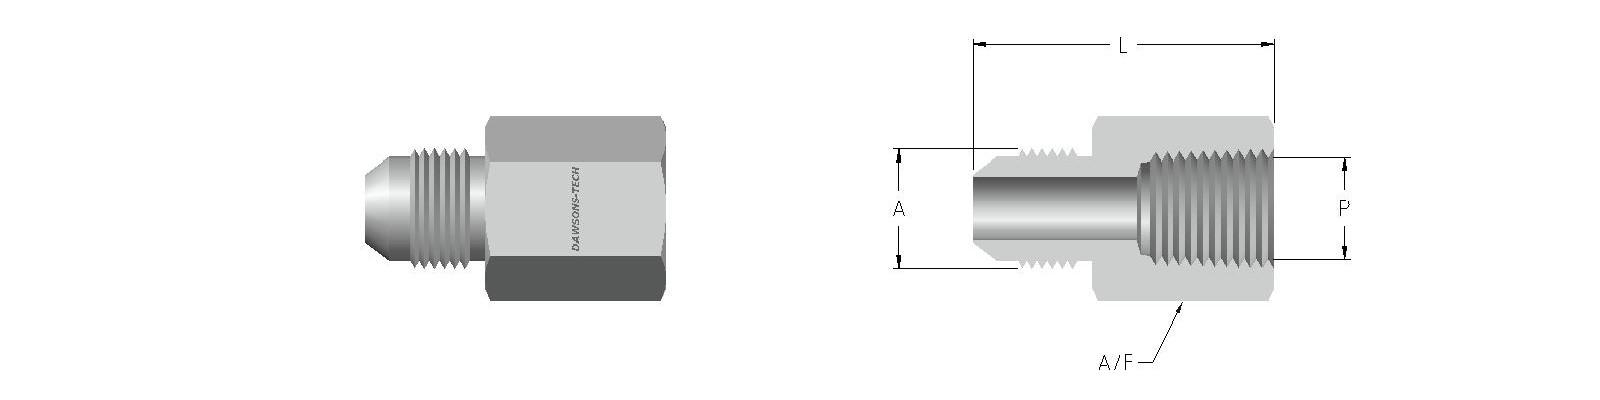 03 Female Connector (37 Flare to Female NPT Thread)